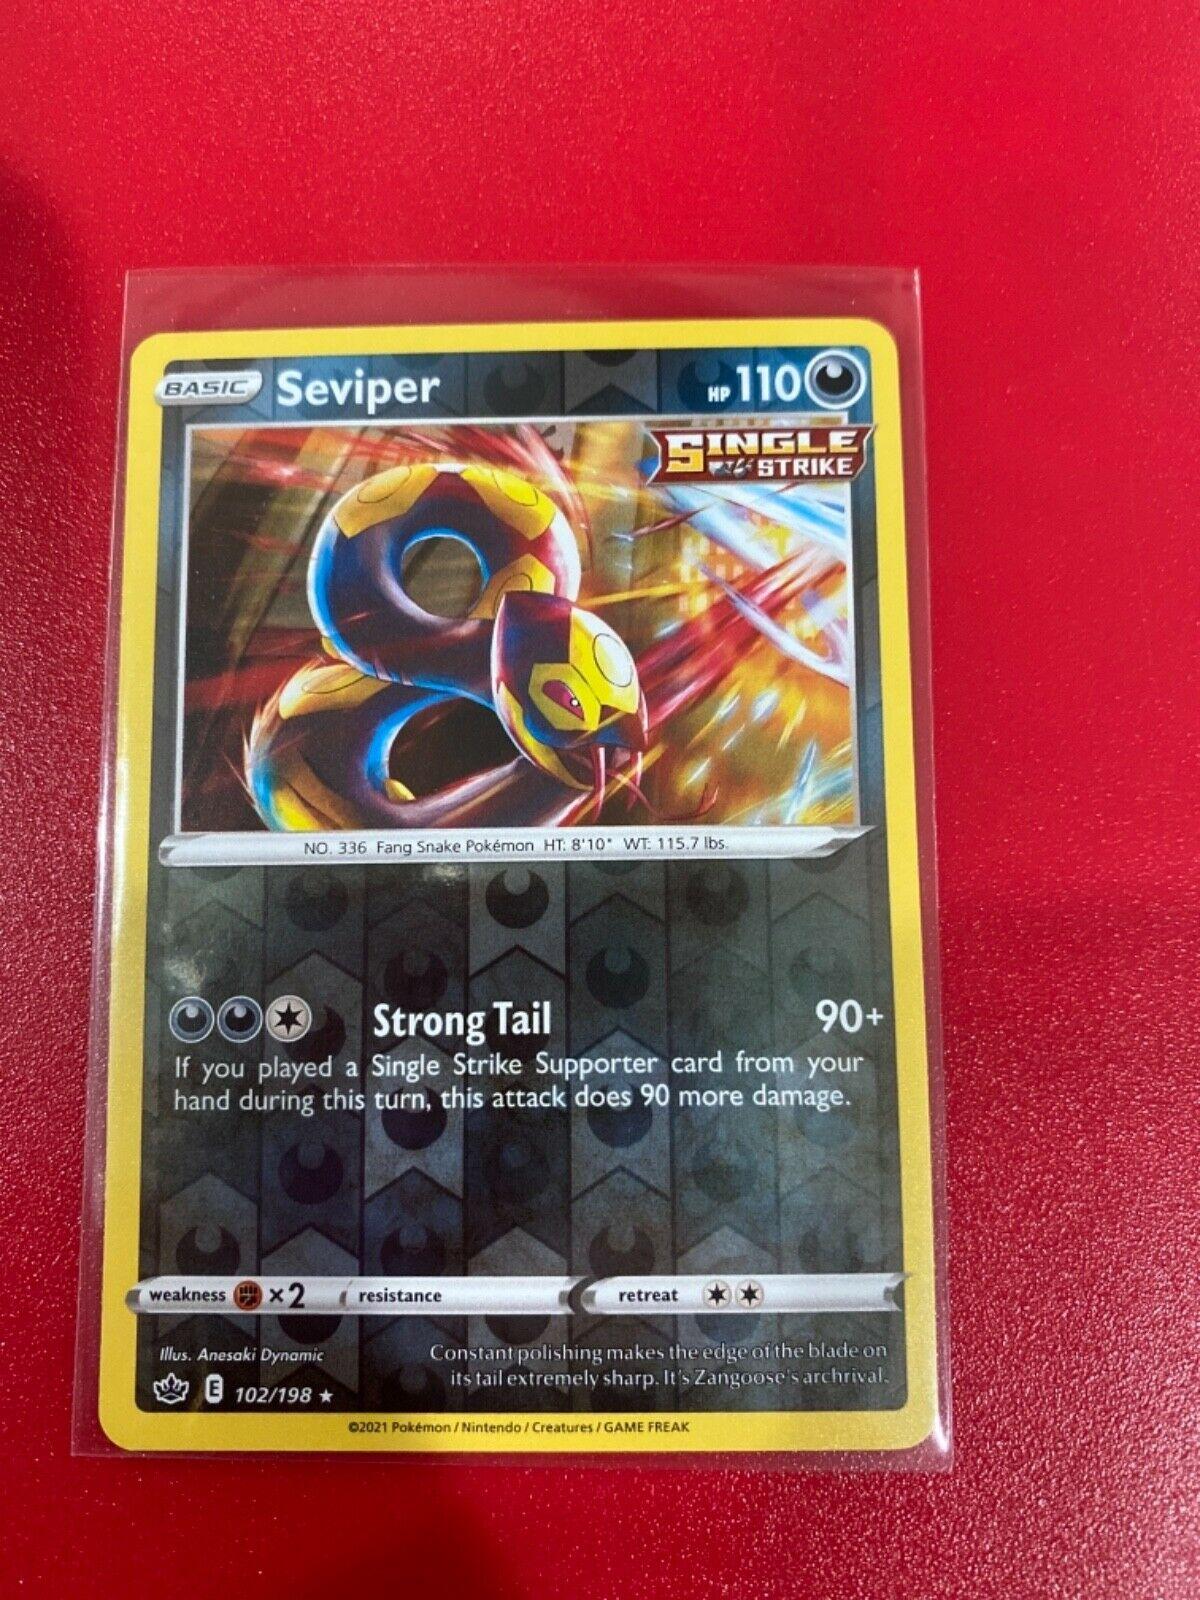 Pokemon TCG Chilling reign reverse holo Seviper 102/198 NM  - Image 1